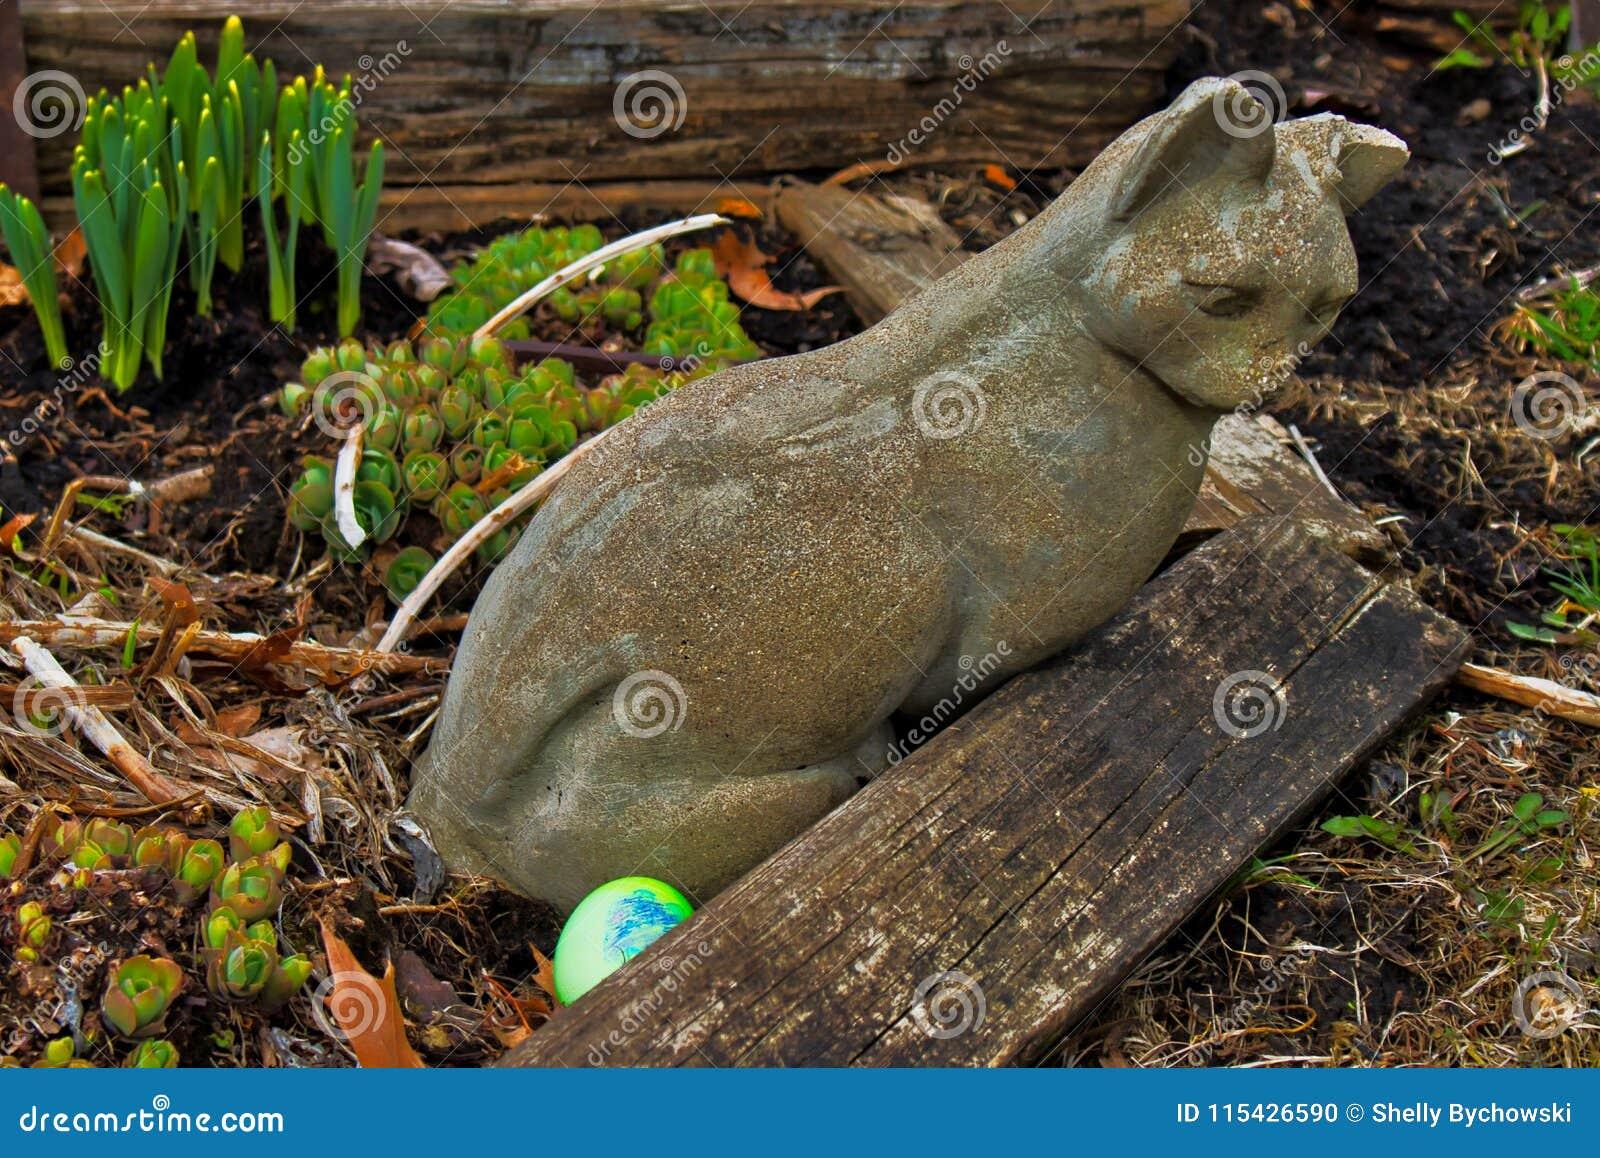 Eggs Hidden For Easter Egg Hunt Near A Garden Statue Of A Stone Cat ...